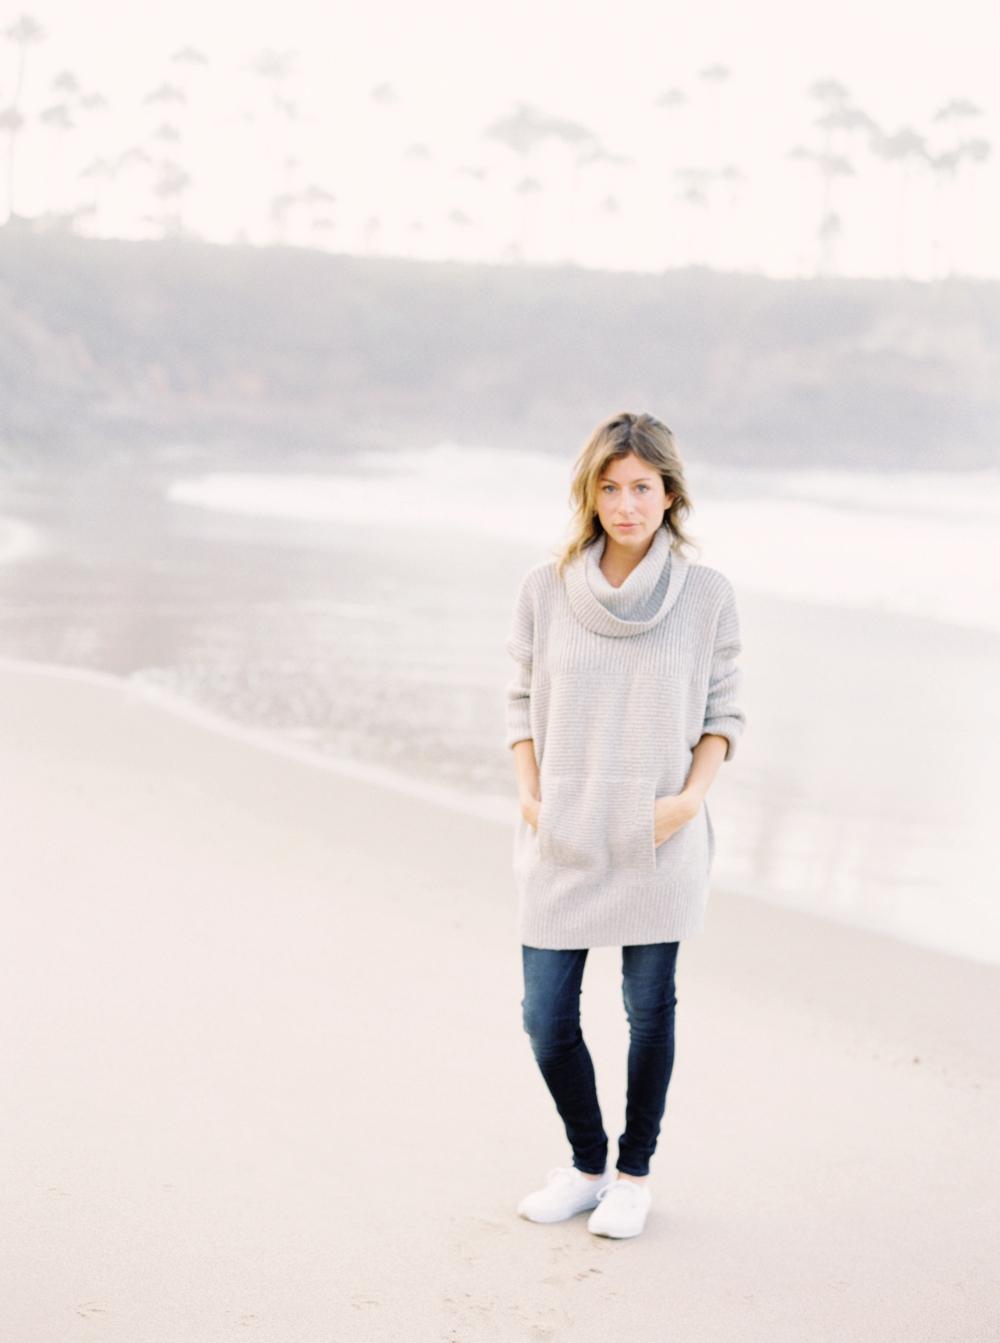 Calgary wedding photographer | fashion photographers | life set sail laguna beach california